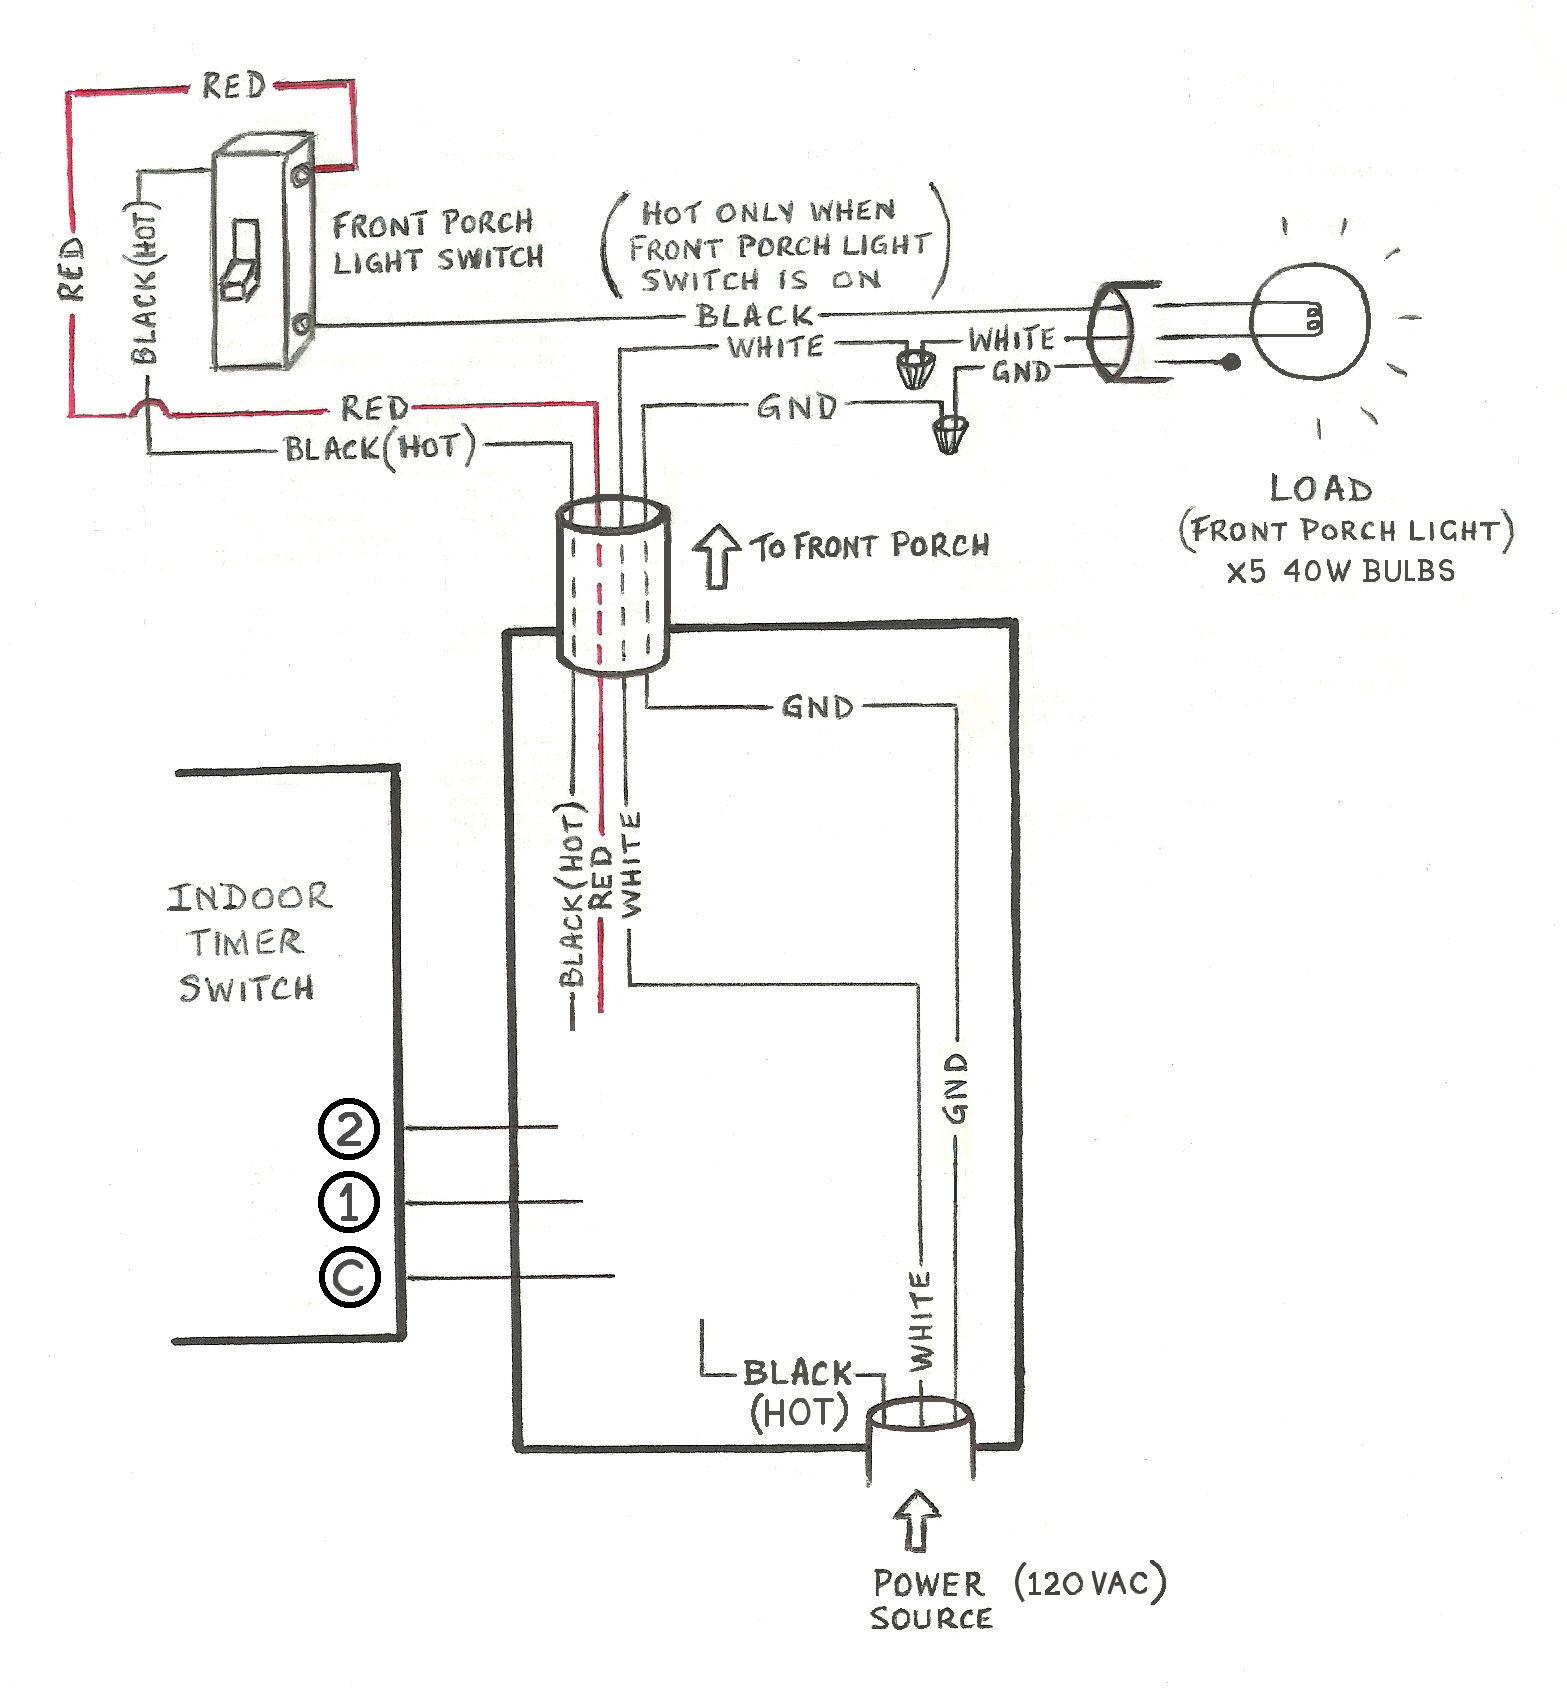 hight resolution of damper fan circuit diagram